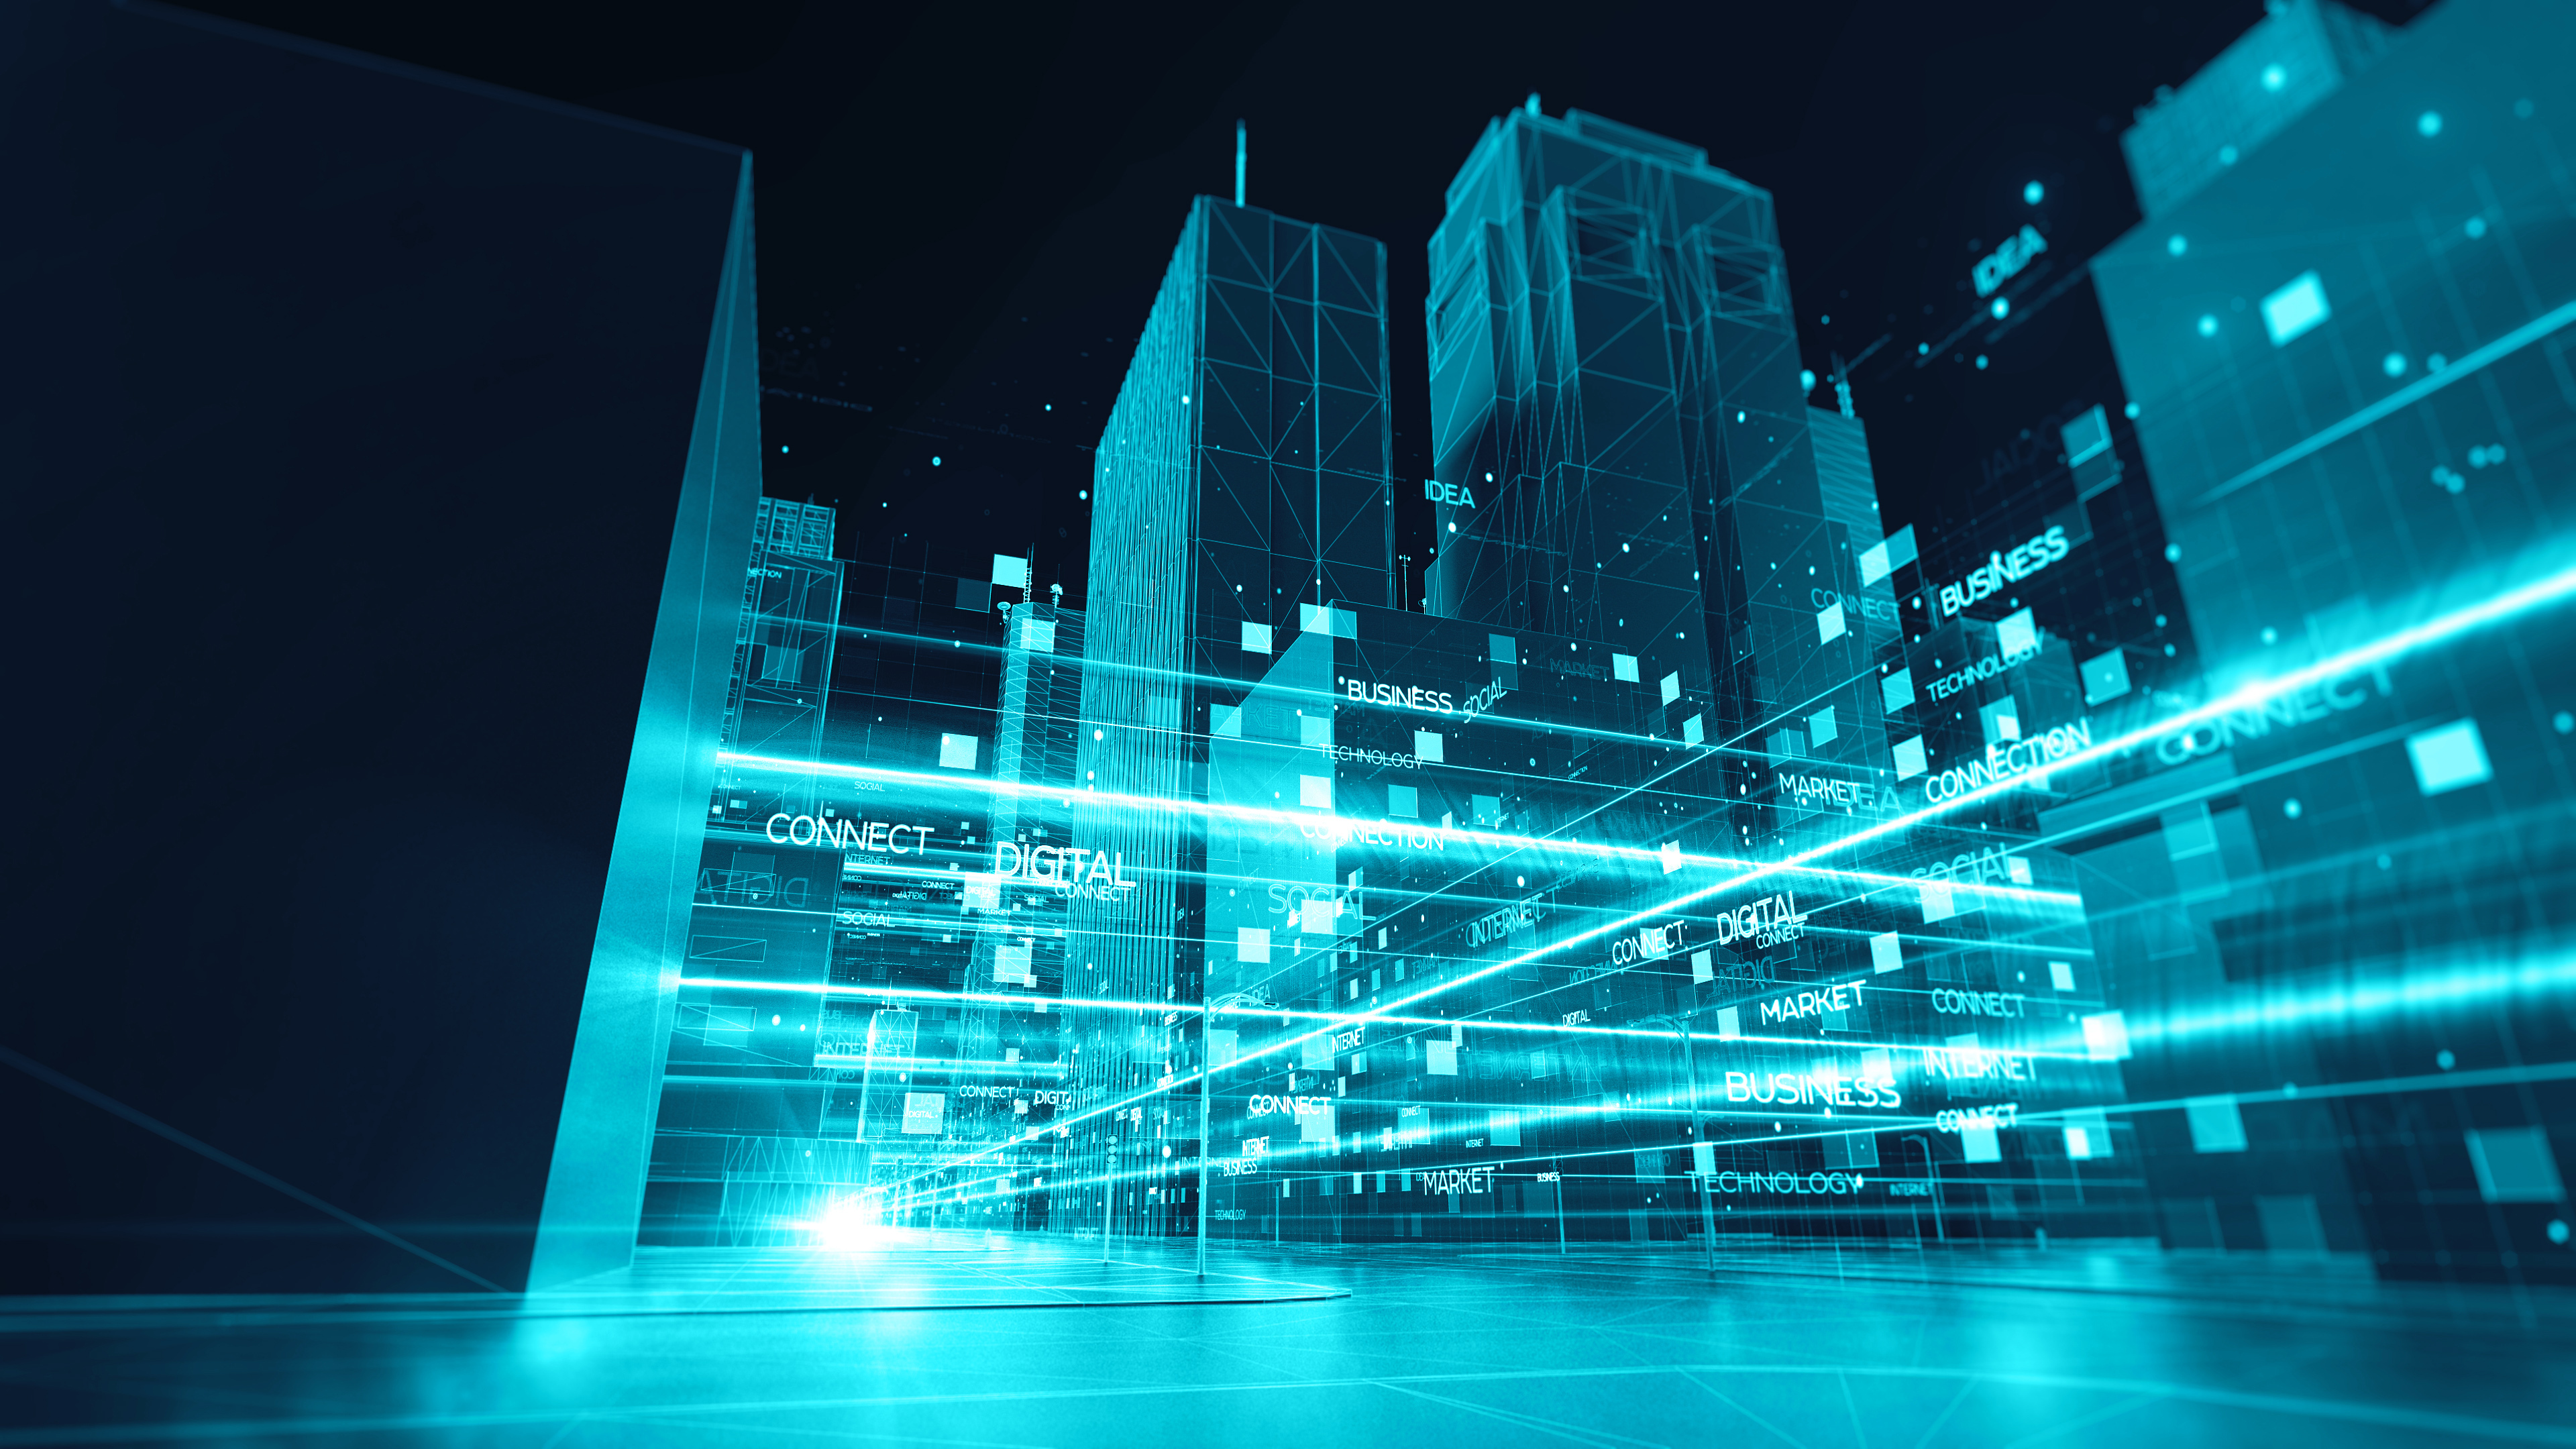 Toma og Property Management Norge går sammen for å digitalisere fremtidens bygg